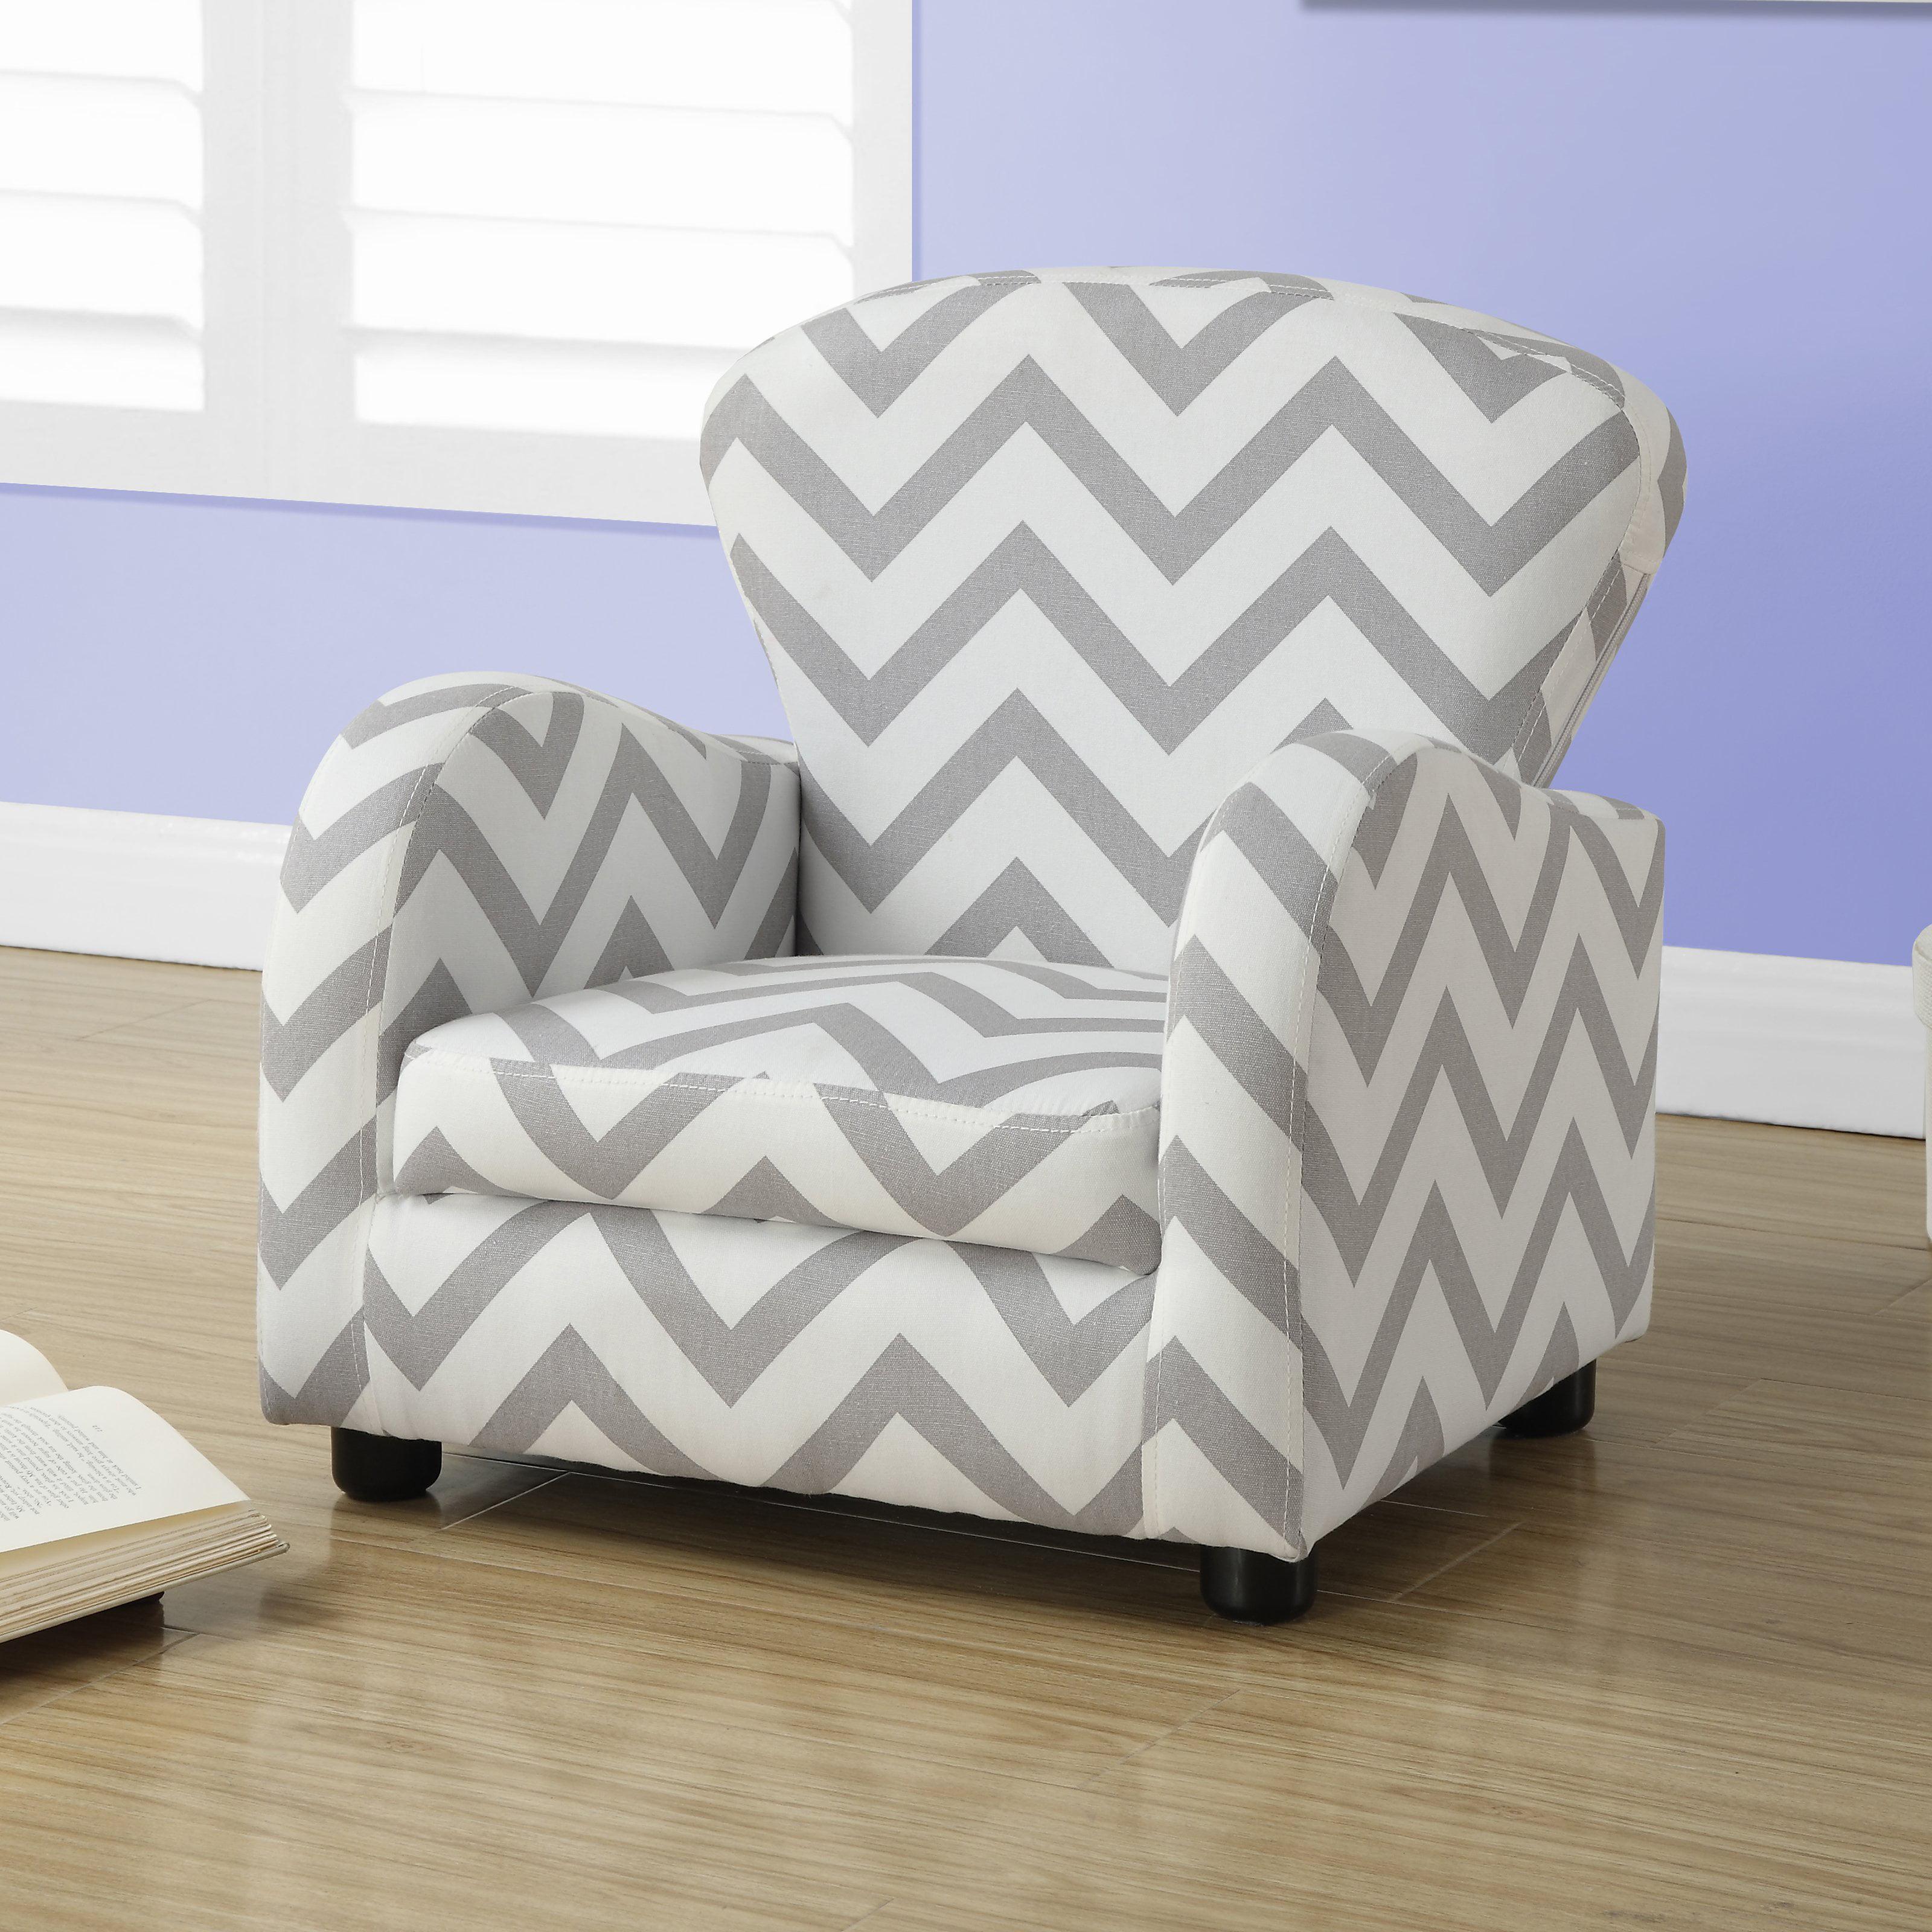 Elegant Monarch Juvenile Chair Grey Chevron Fabric   Walmart.com